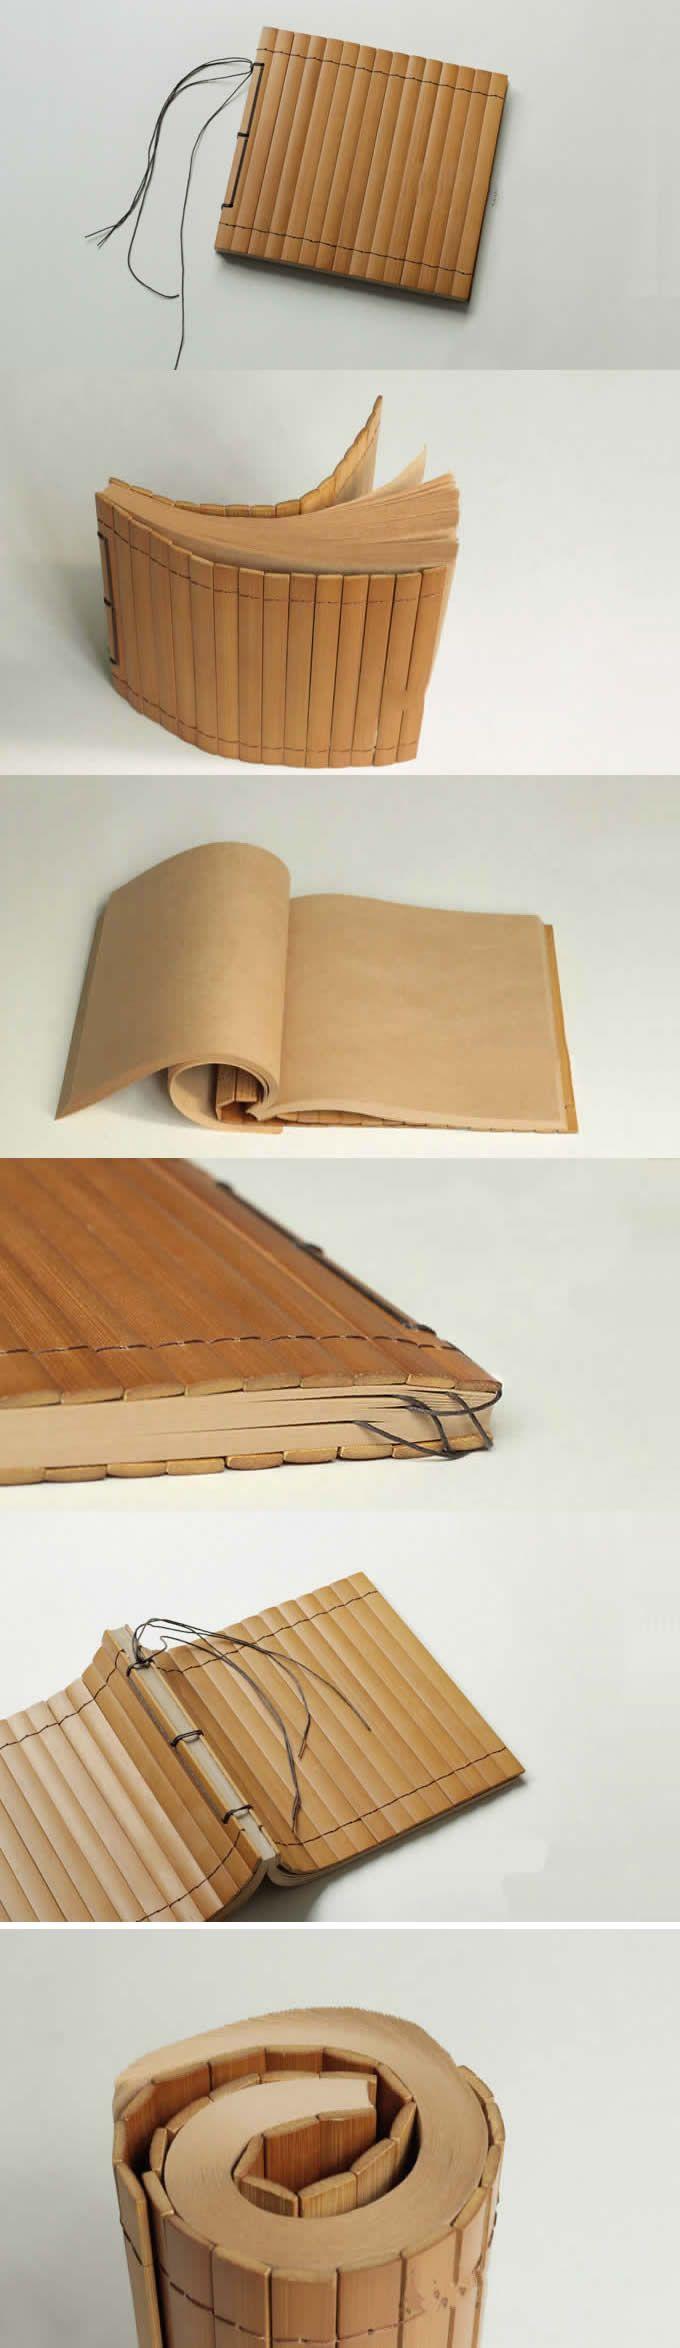 Bamboo Cover Notebook Sampul Buku Buku Catatan Buku Bagus